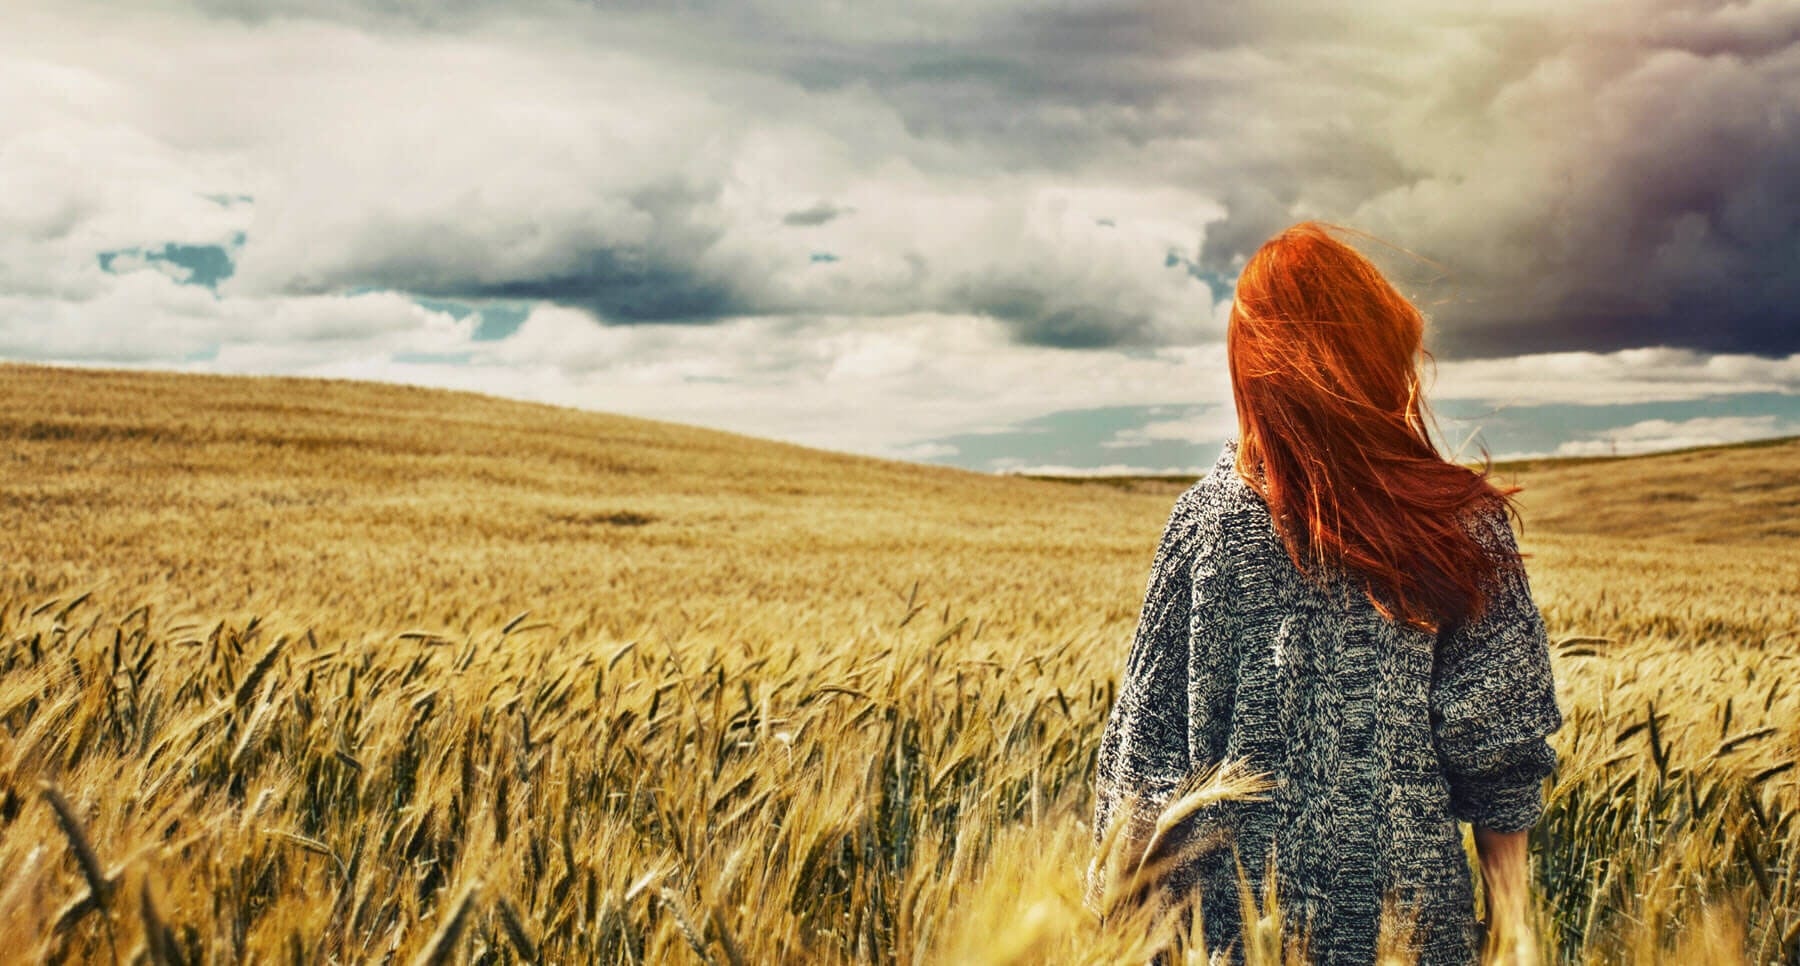 Breaking free from Self-Harm